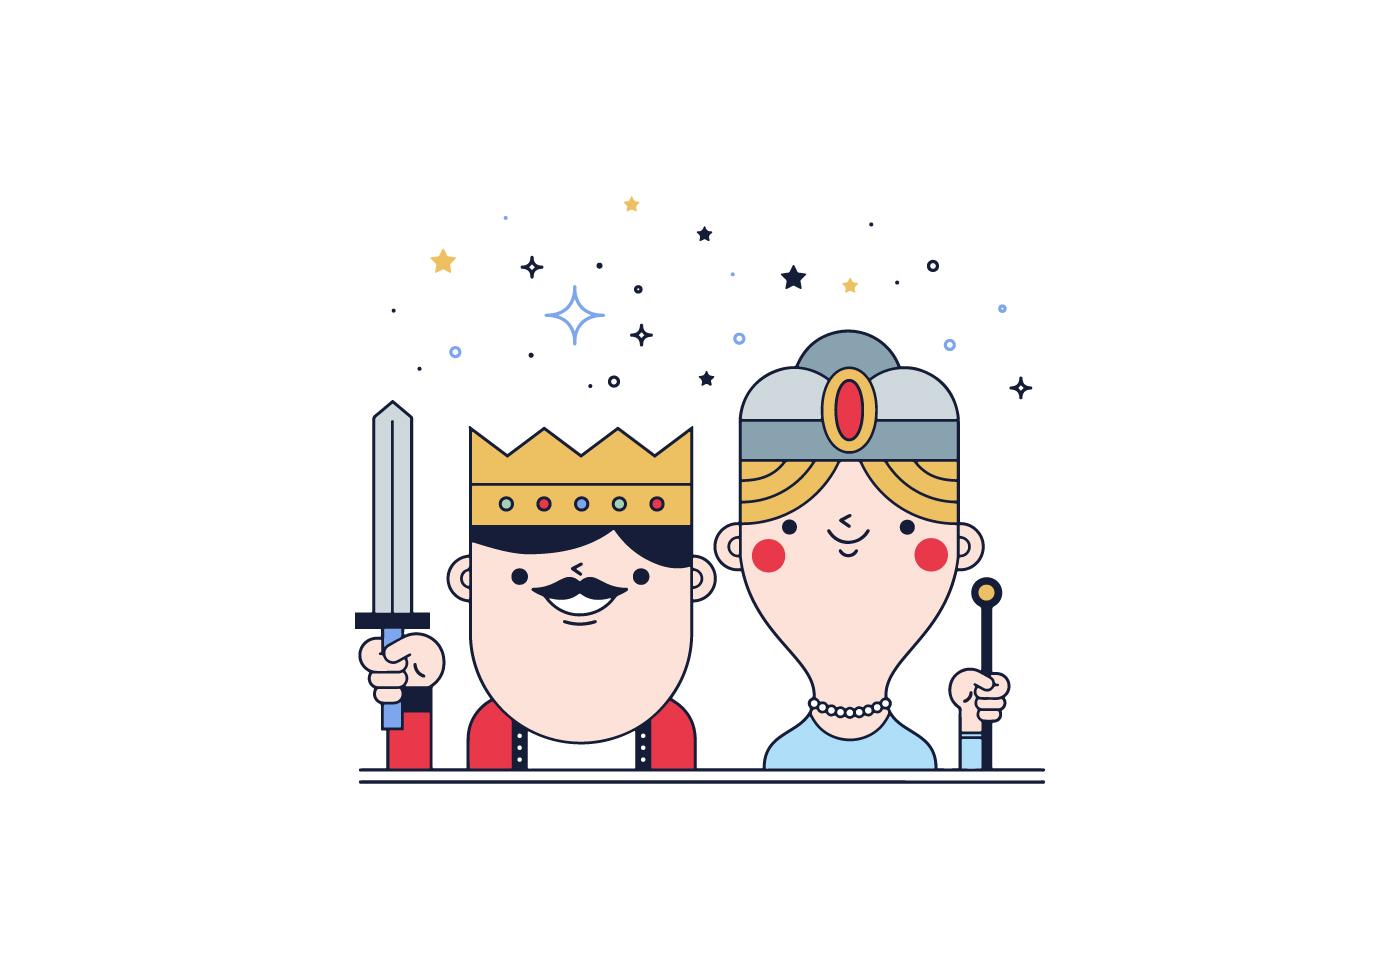 King Free Vector Art - (2184 Free Downloads)